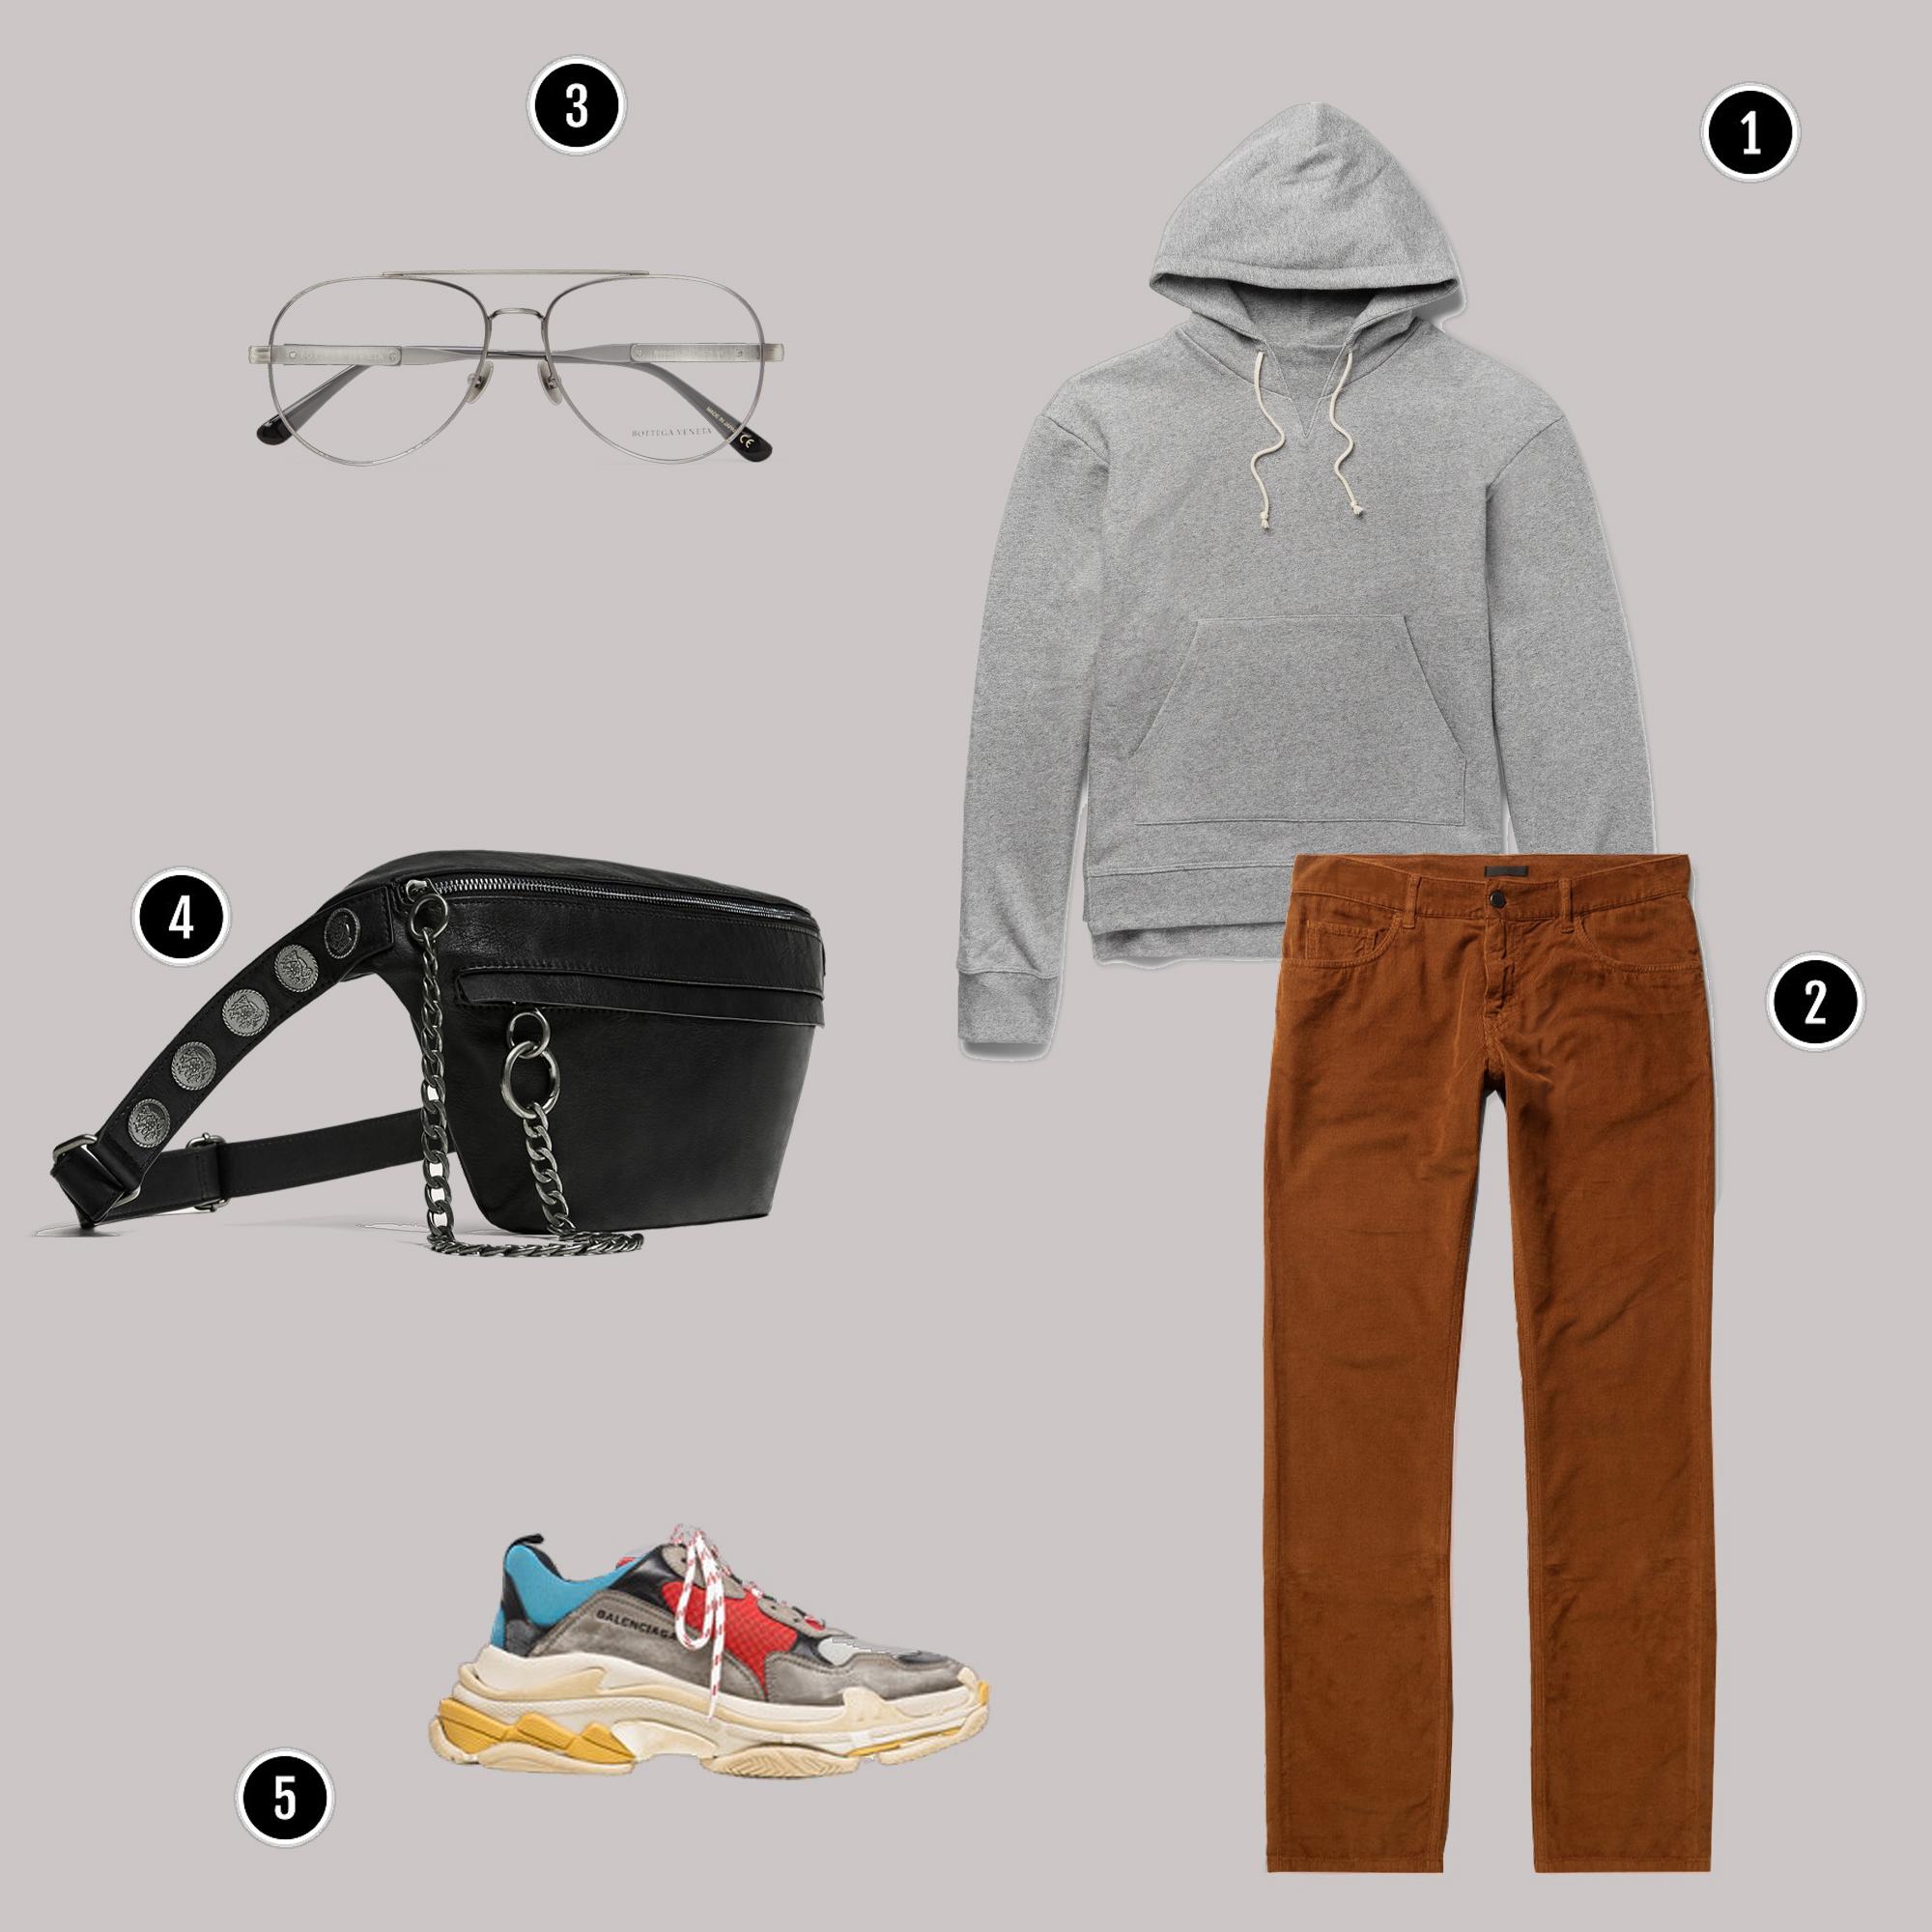 1. Áo: JOHN ELLIOTT / 2. Quần: Acne / 3. Kính: Bottega veneta / 4. Túi: Zara / 5. Giày: Balenciaga